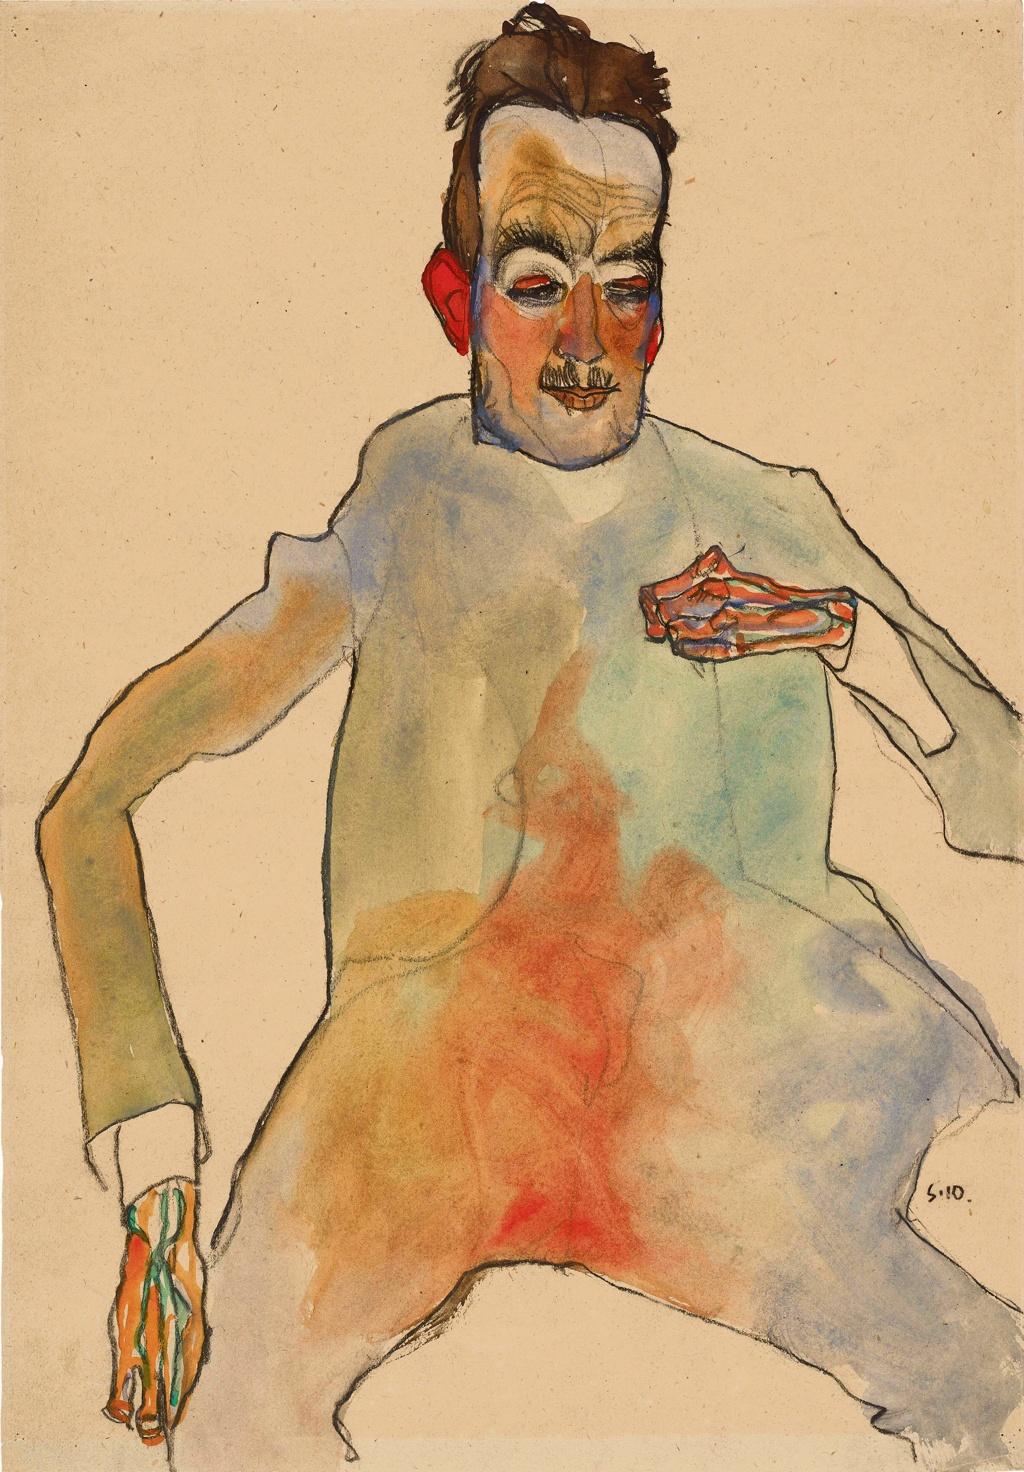 Egon Schiele, The Cellist, 1910